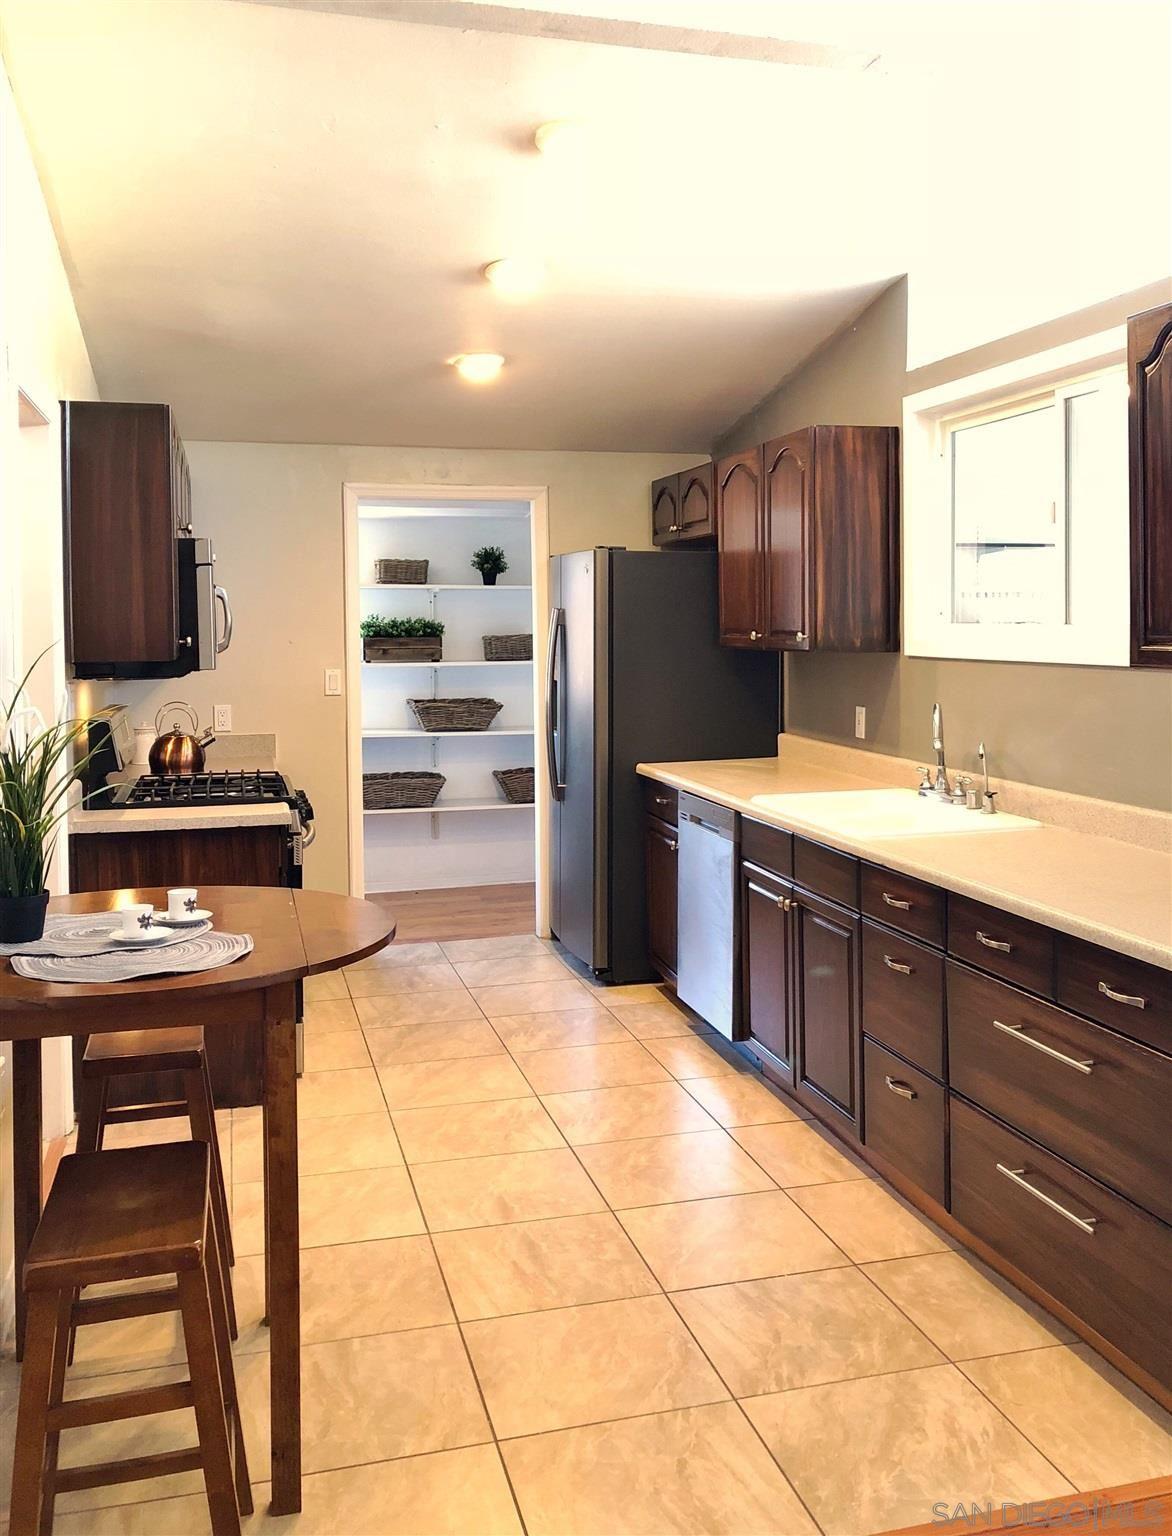 Photo of 13727 Powers Rd, Poway, CA 92064 (MLS # 210001037)